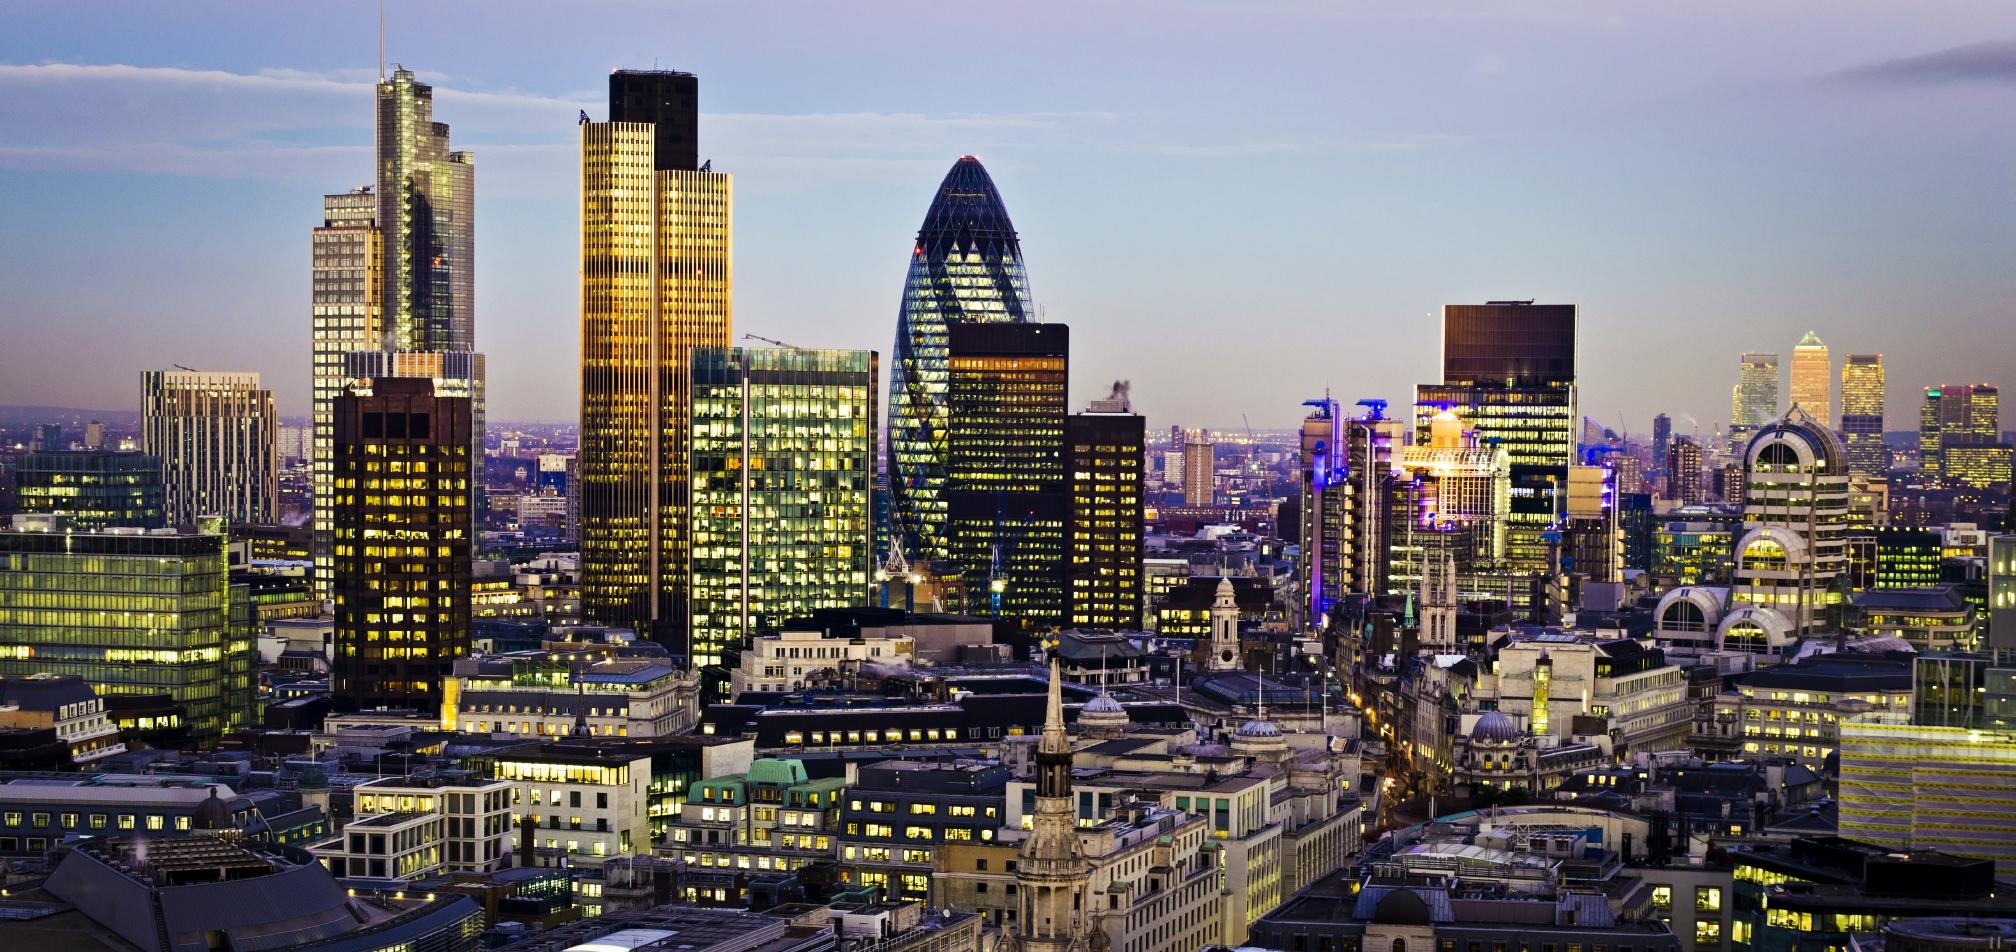 istock image london night landscape.jpg